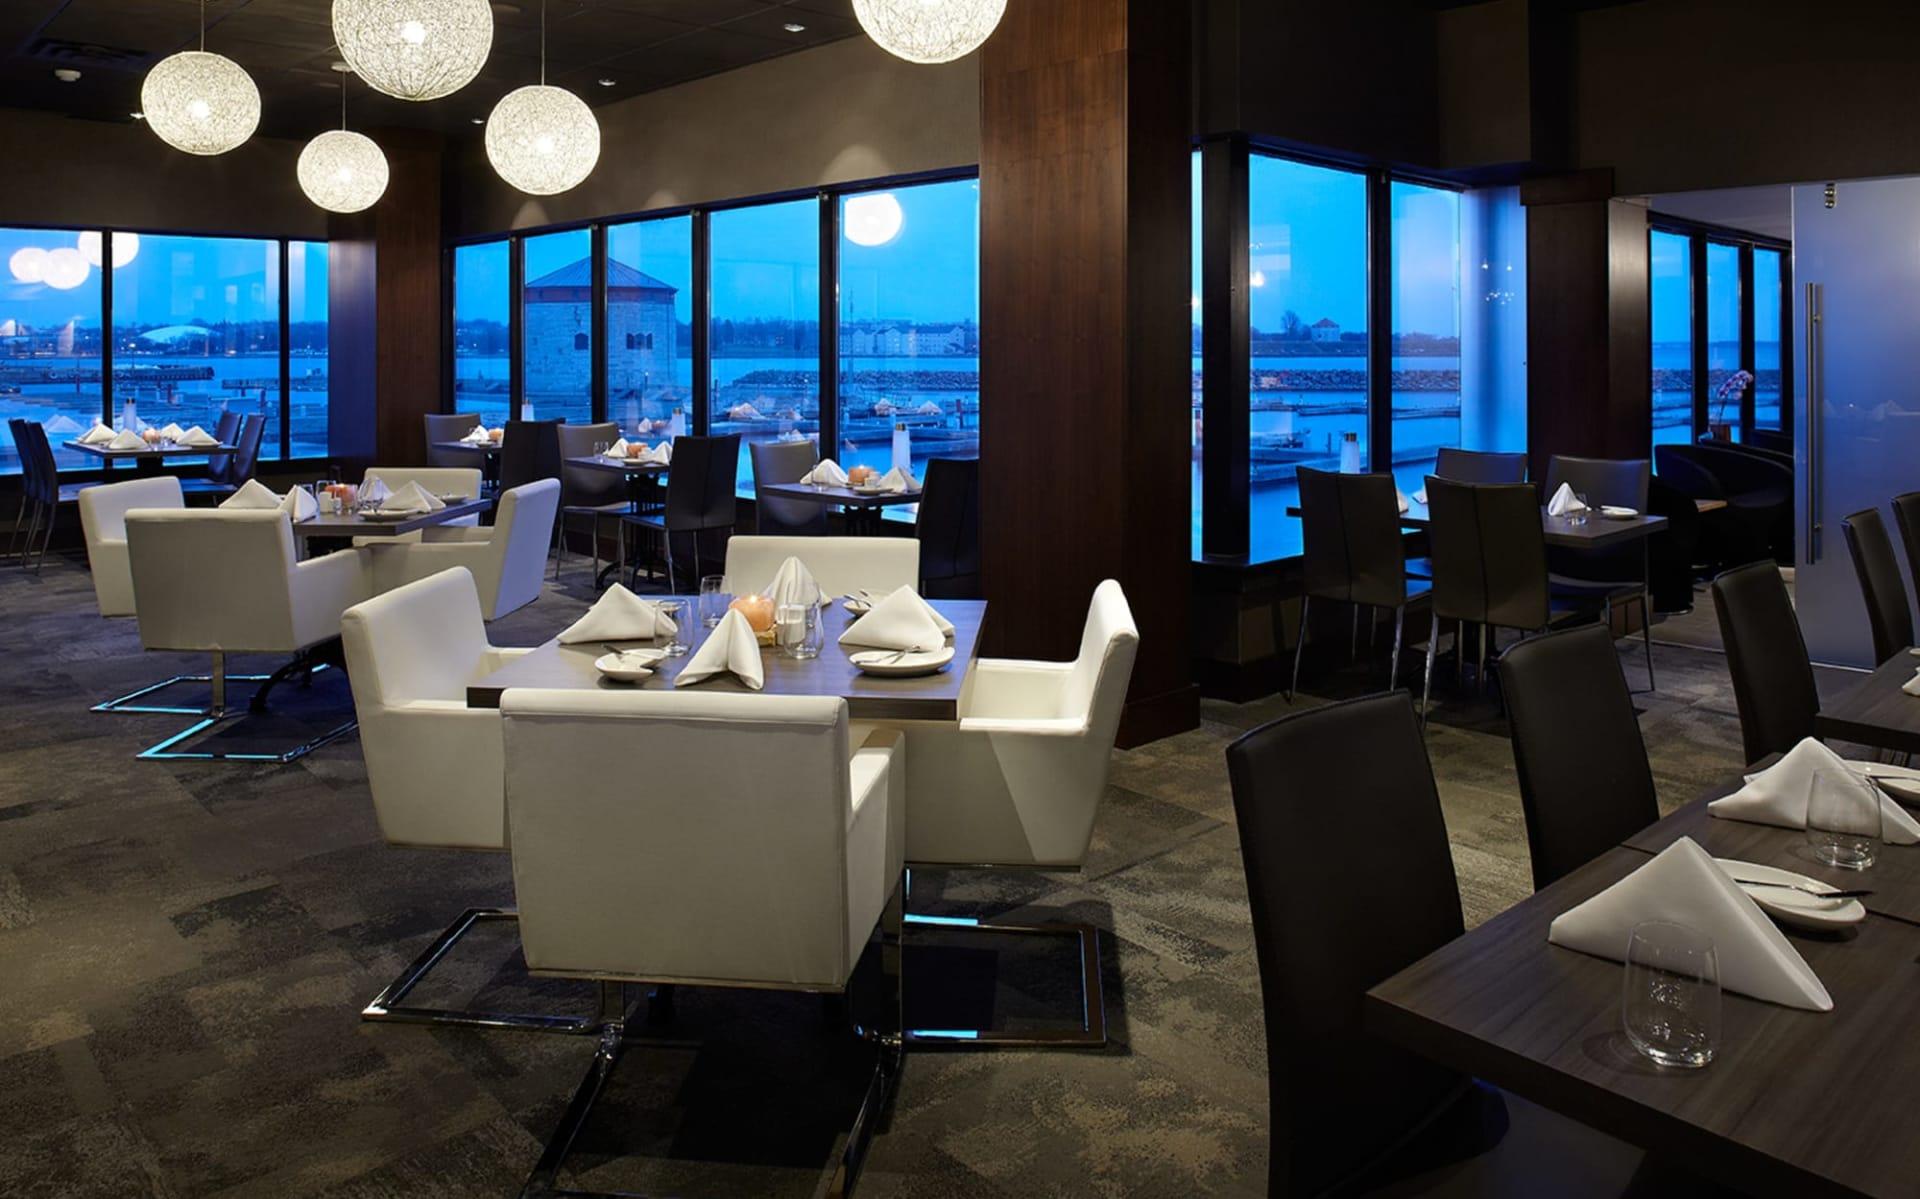 Delta Kingston Waterfront Hotel: facilities_Delta Kingston Waterfront Hotel_RestaurantAquaTerra